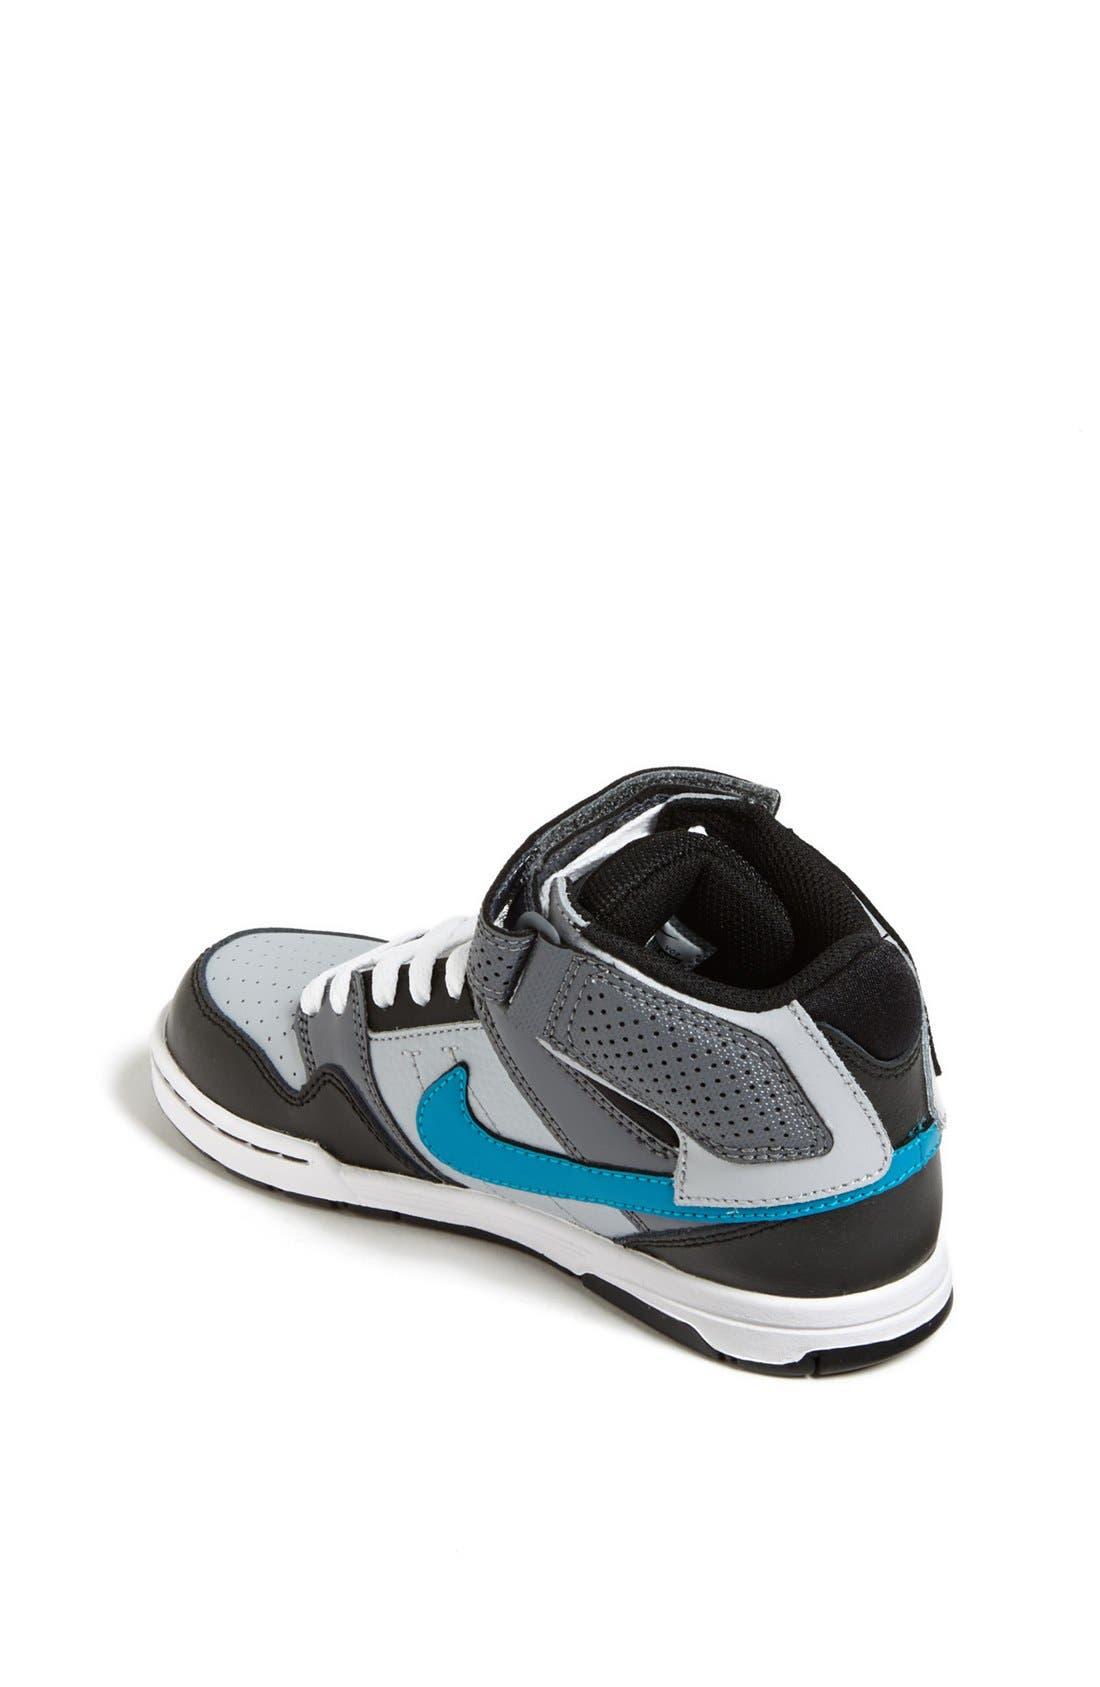 Alternate Image 2  - Nike 6.0 'Mogan Mid' Sneaker (Toddler, Little Kid & Big Kid)